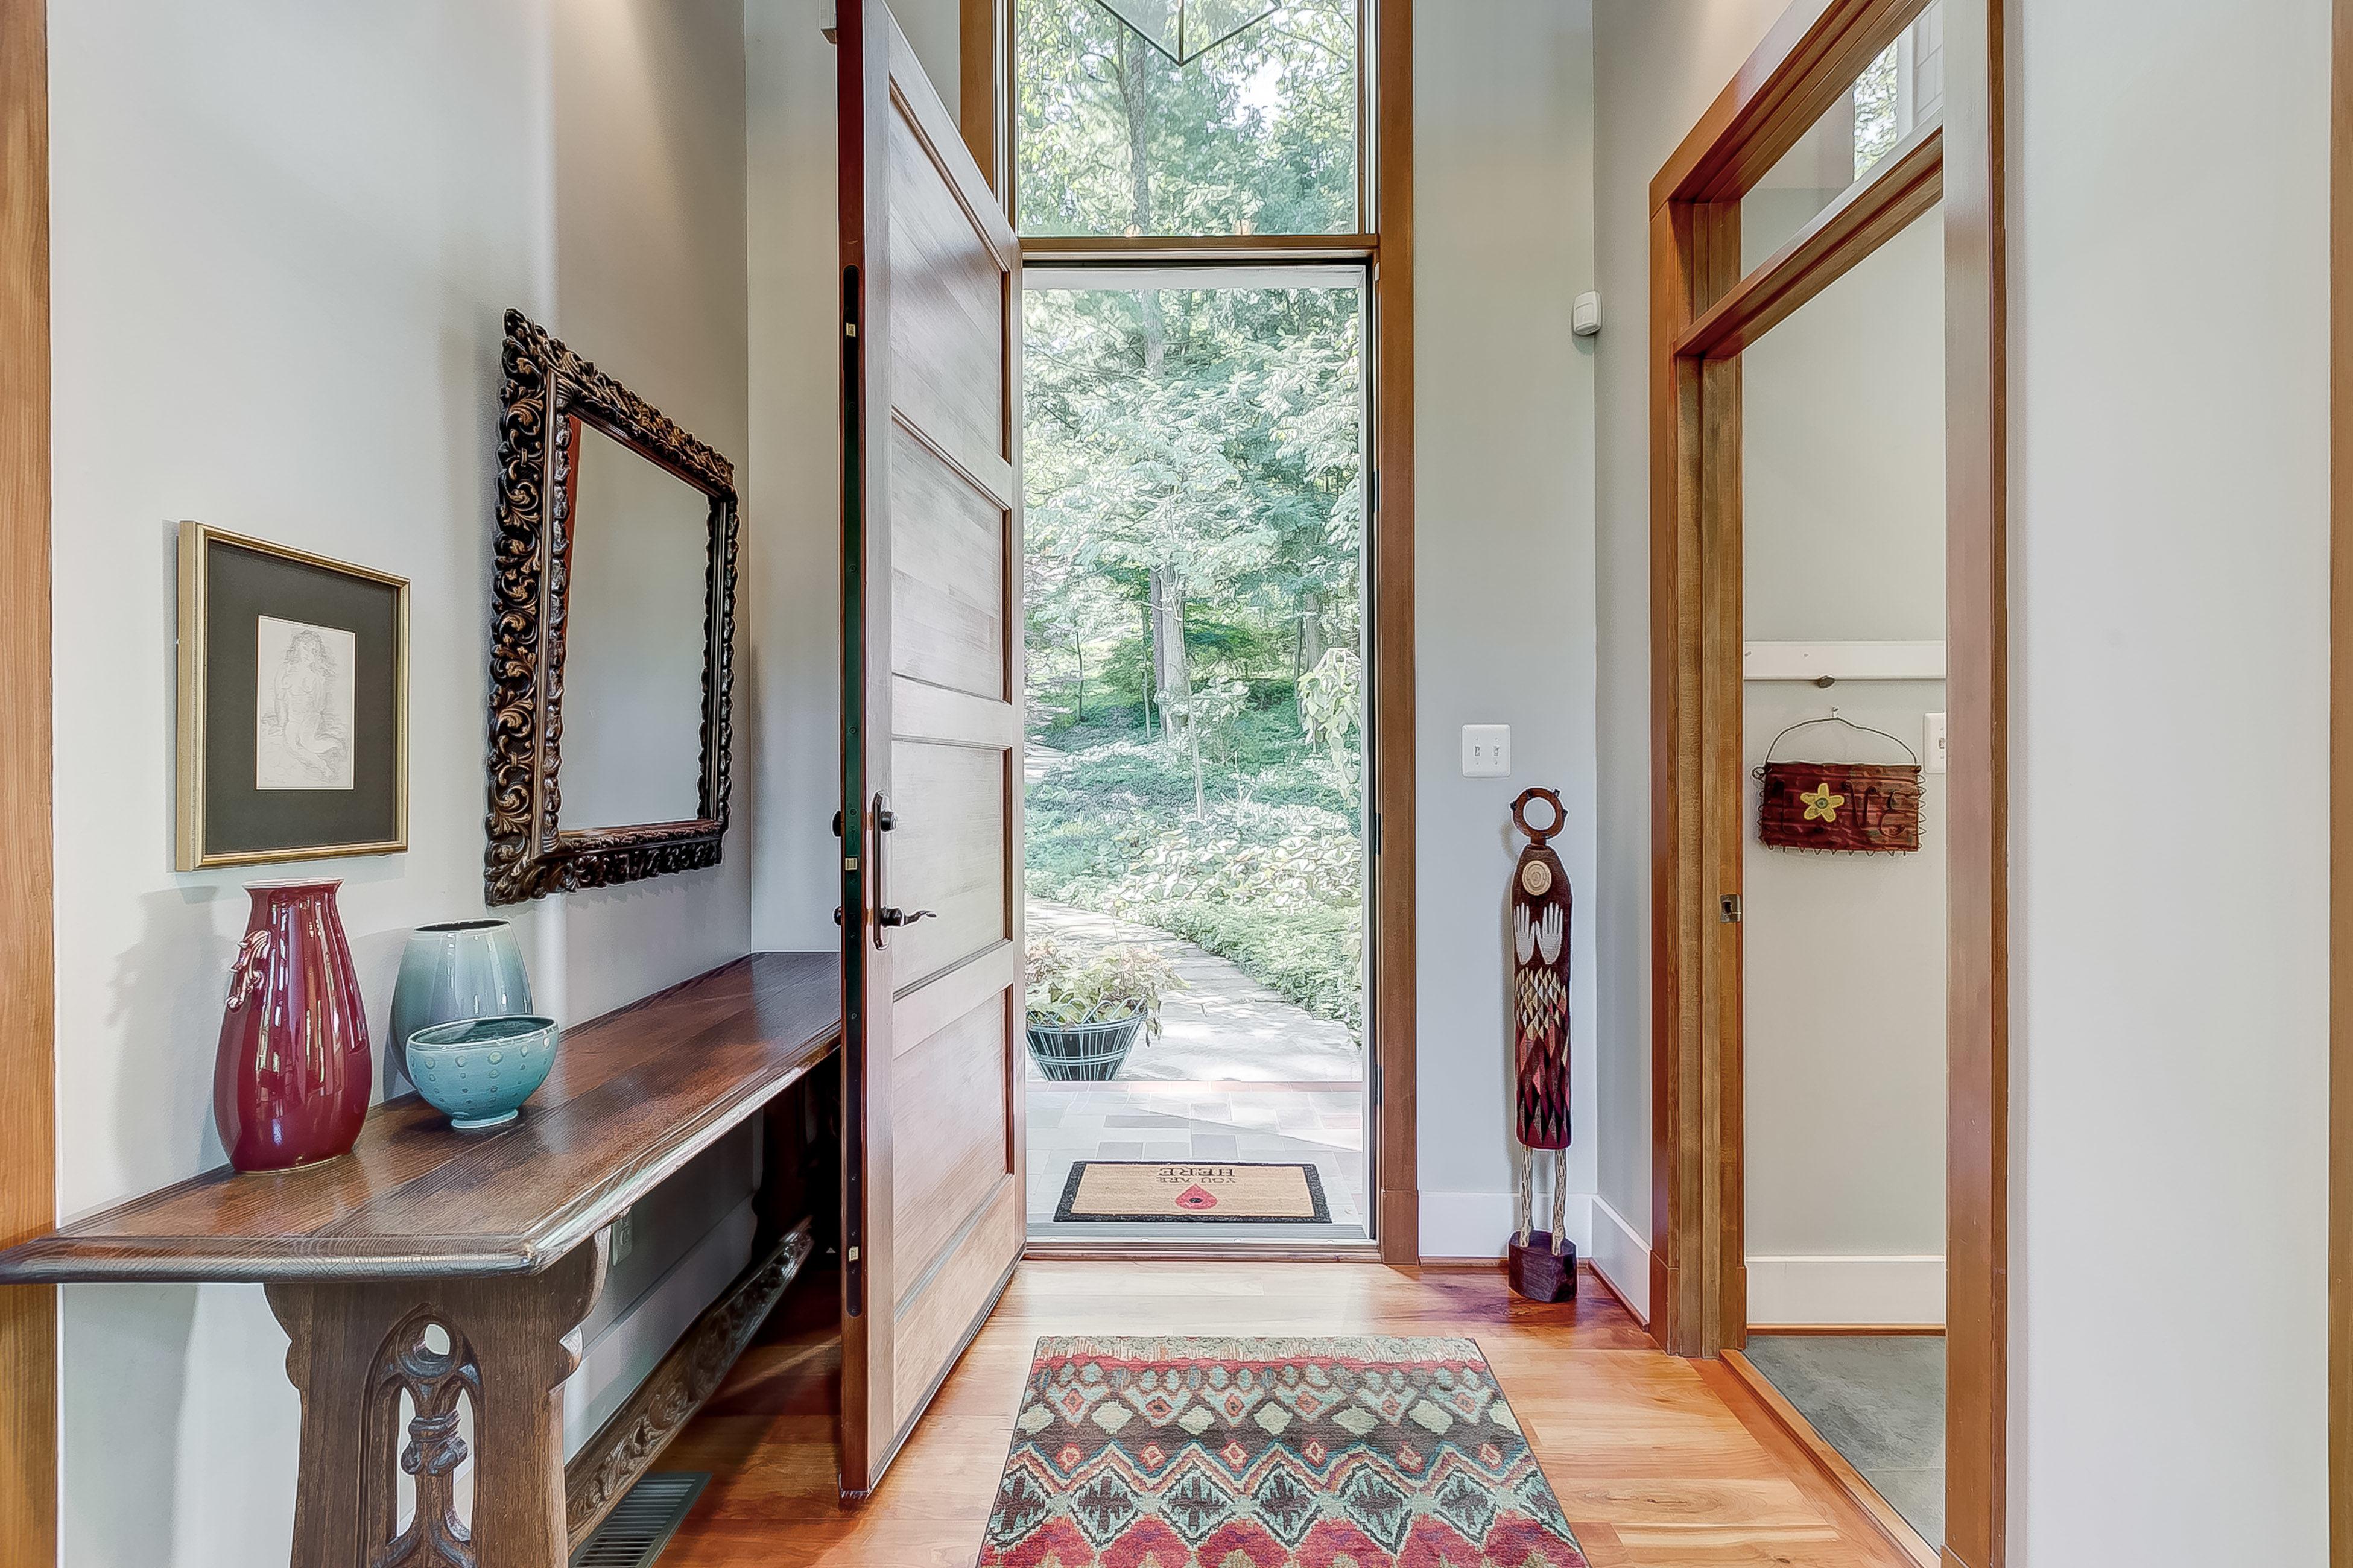 turn around + appreciate the custom millwork + cherry floors